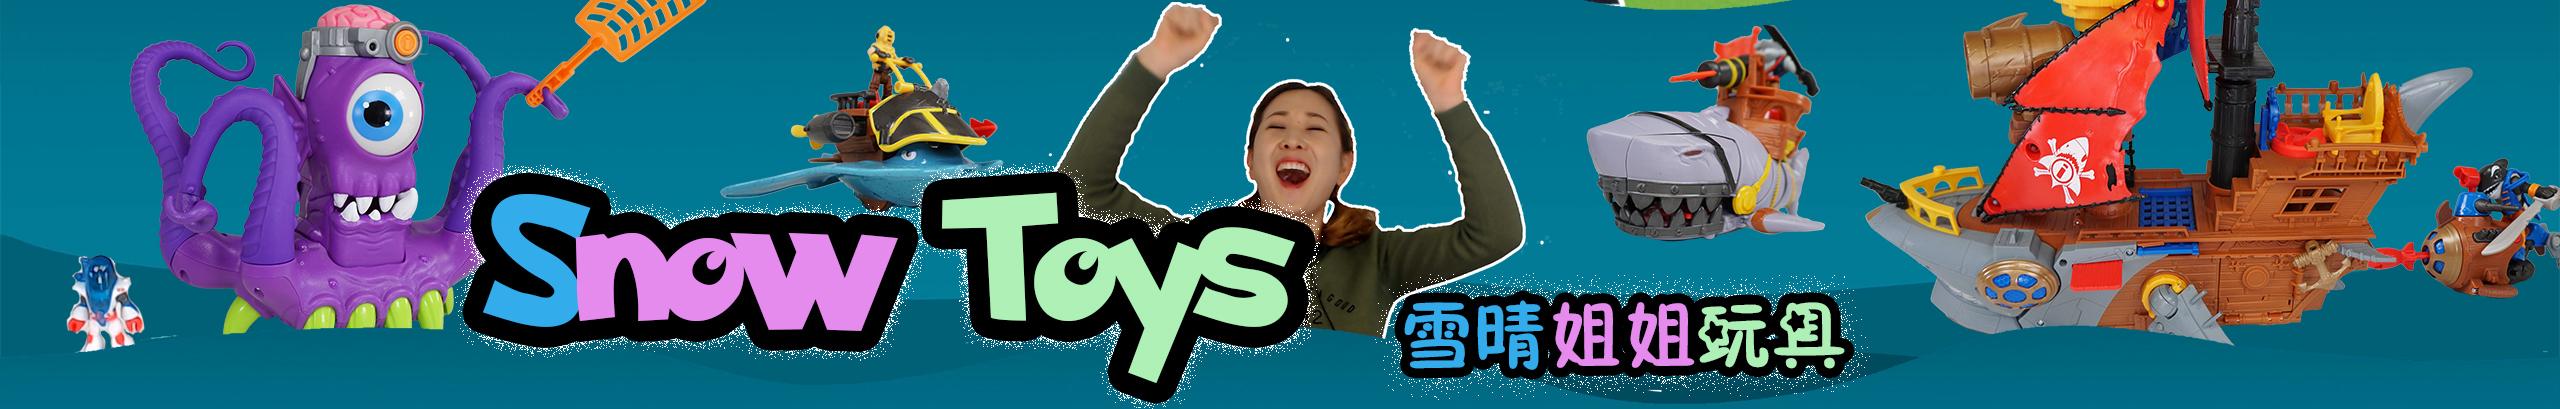 雪晴姐姐玩具 banner